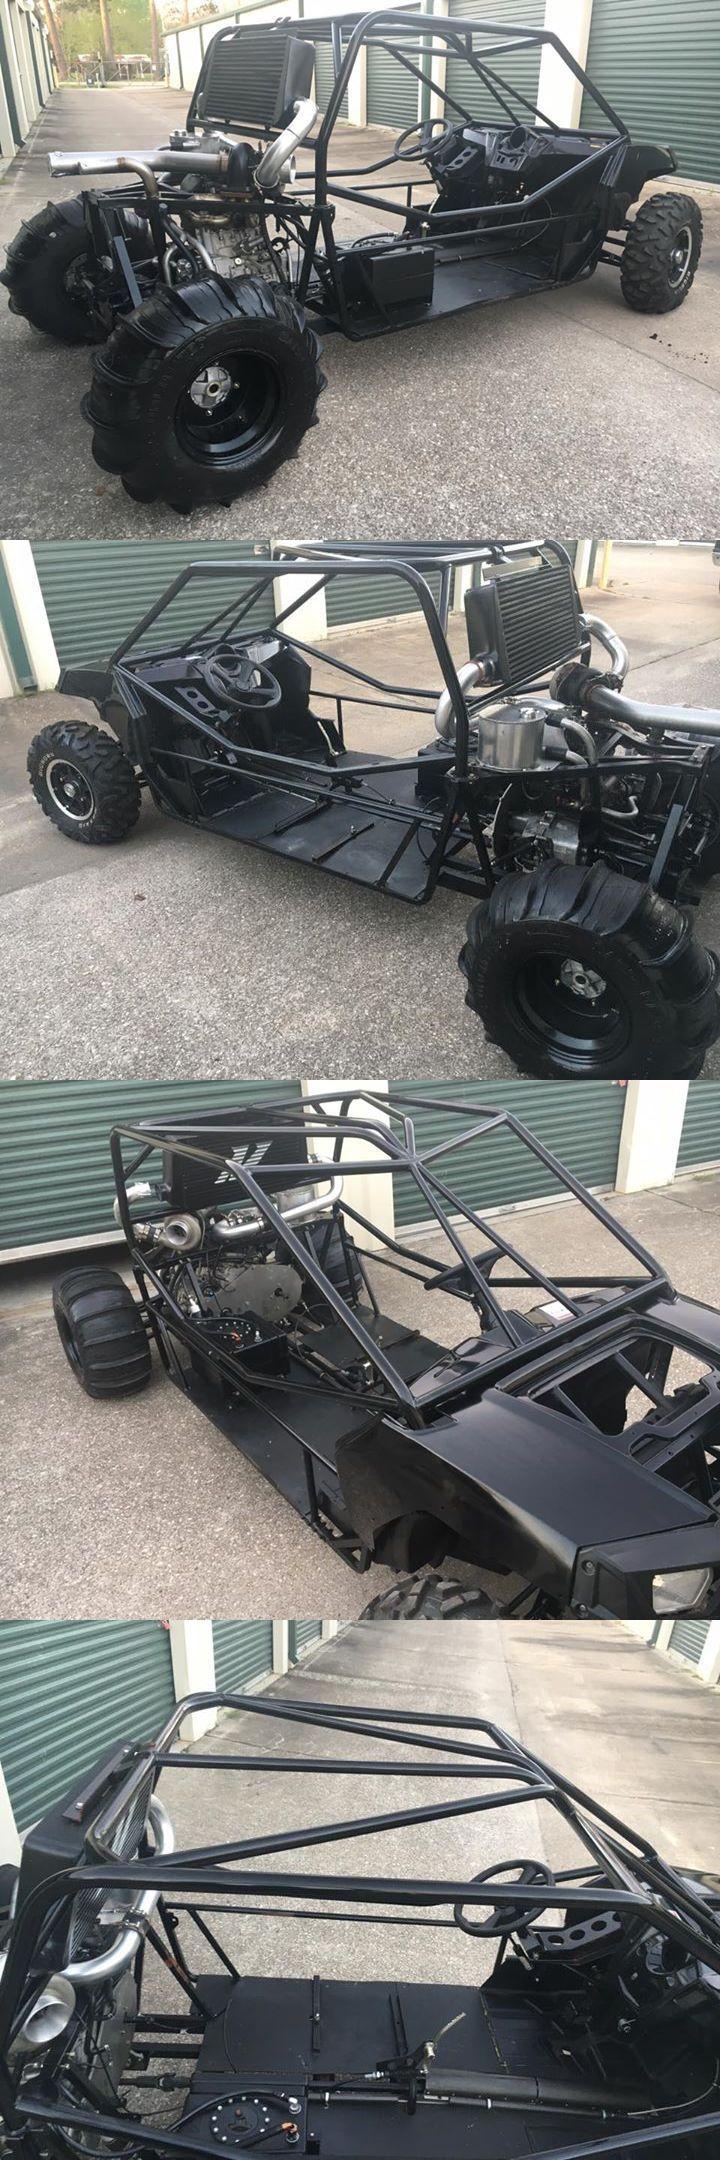 Power Sports ATVs UTVs: Z1 Turbo Rzr Build 1100Cc Artic Cat Polaris Utv Atv Dune Sand Rail Project BUY IT NOW ONLY: $15000.0